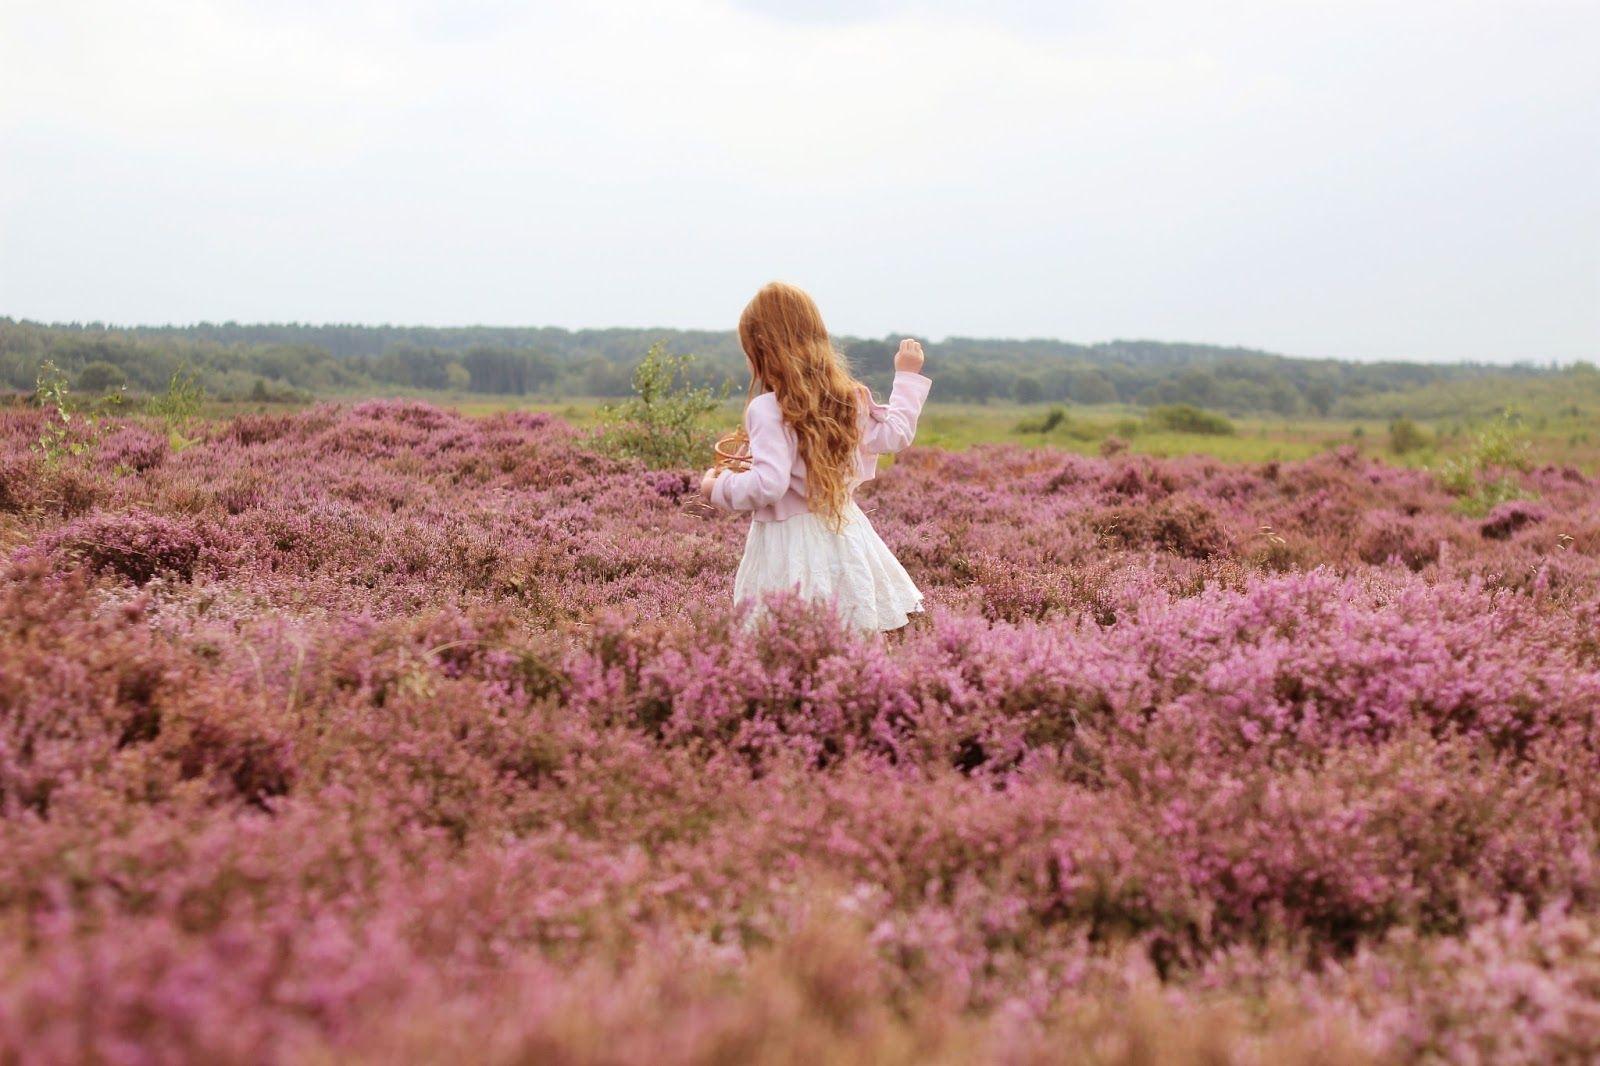 Gingerlillytea: In the heather